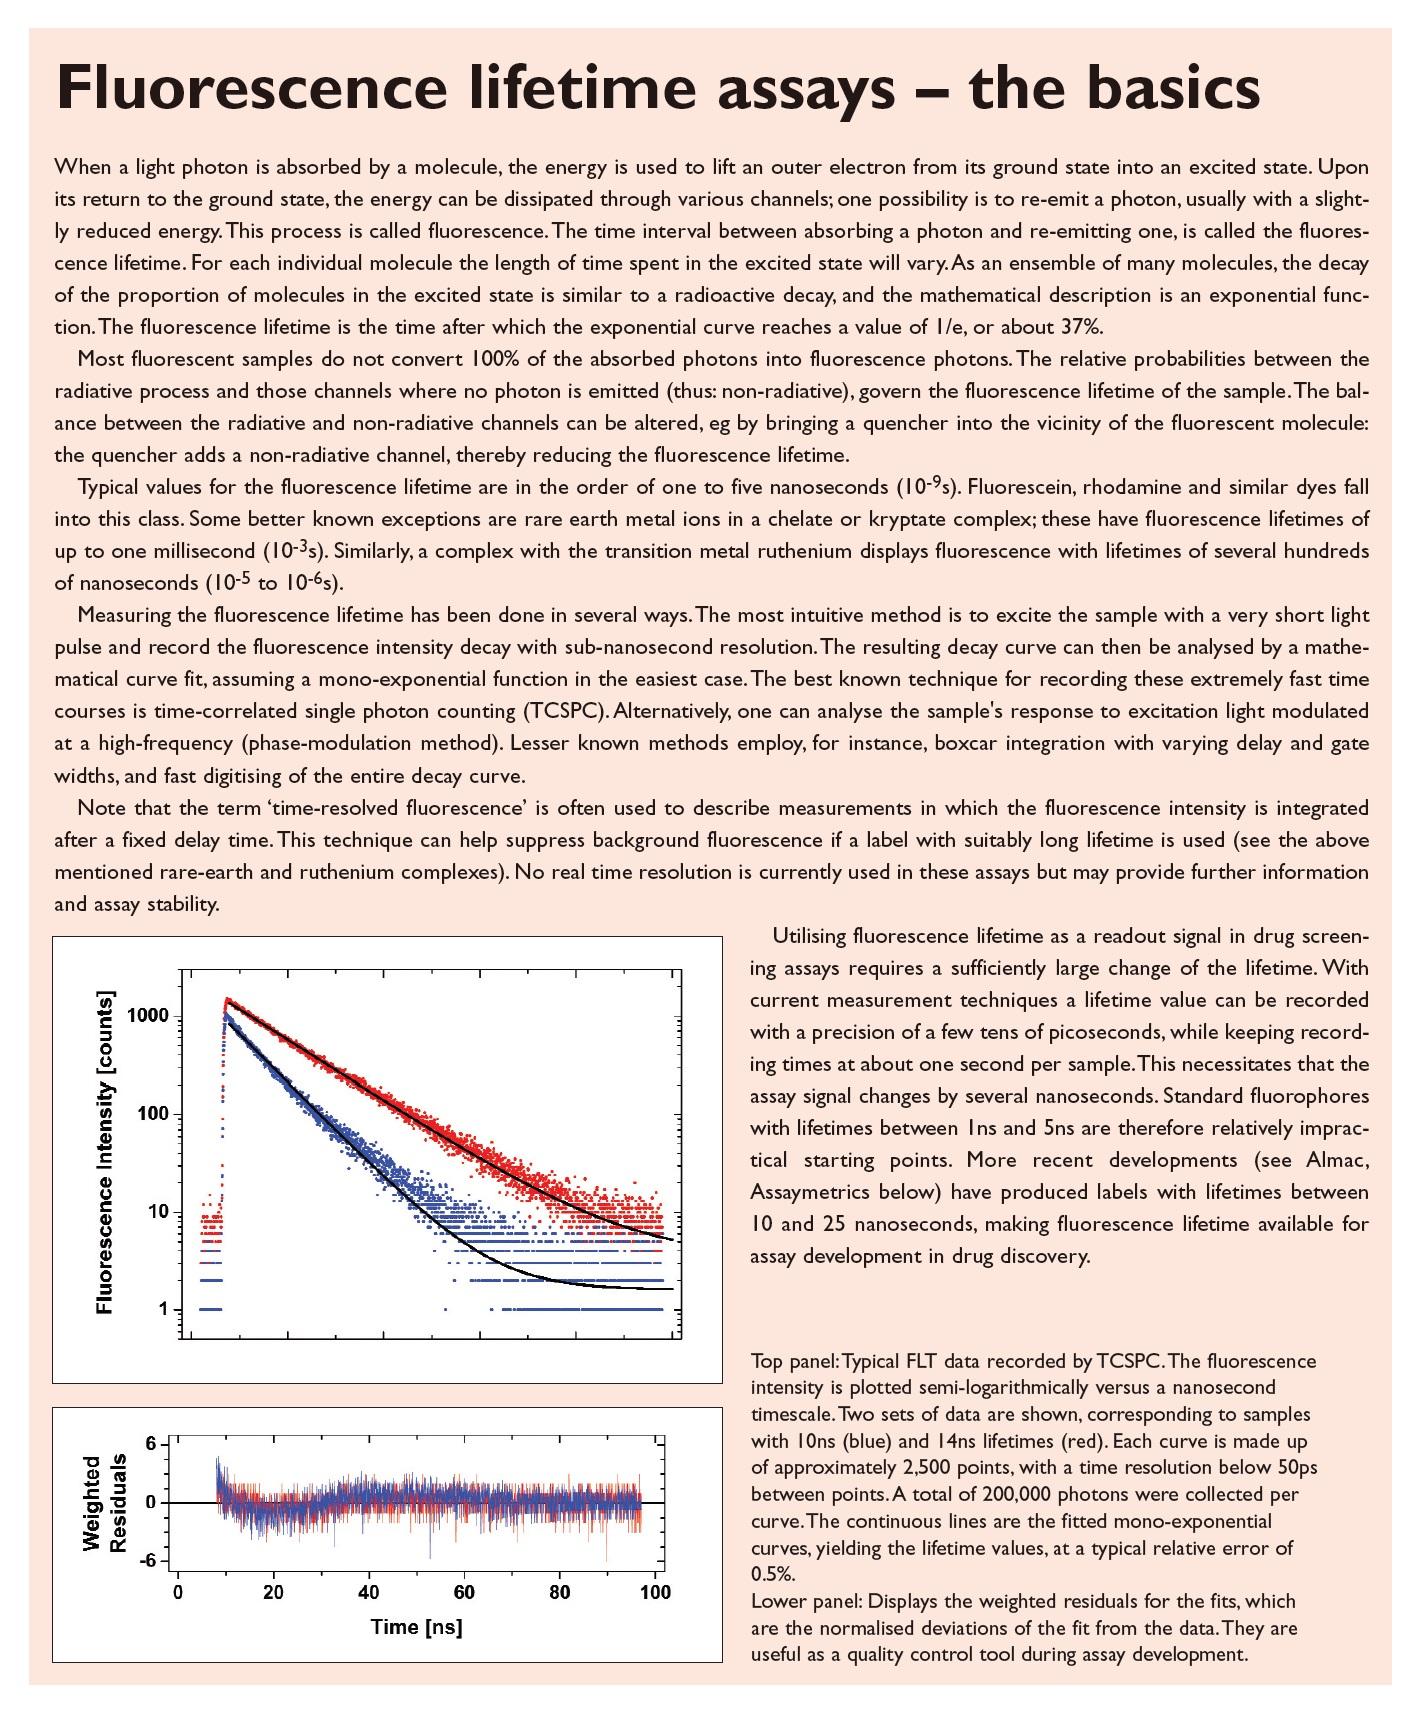 Excerpt 1 Fluorescence lifetime assays, the basics